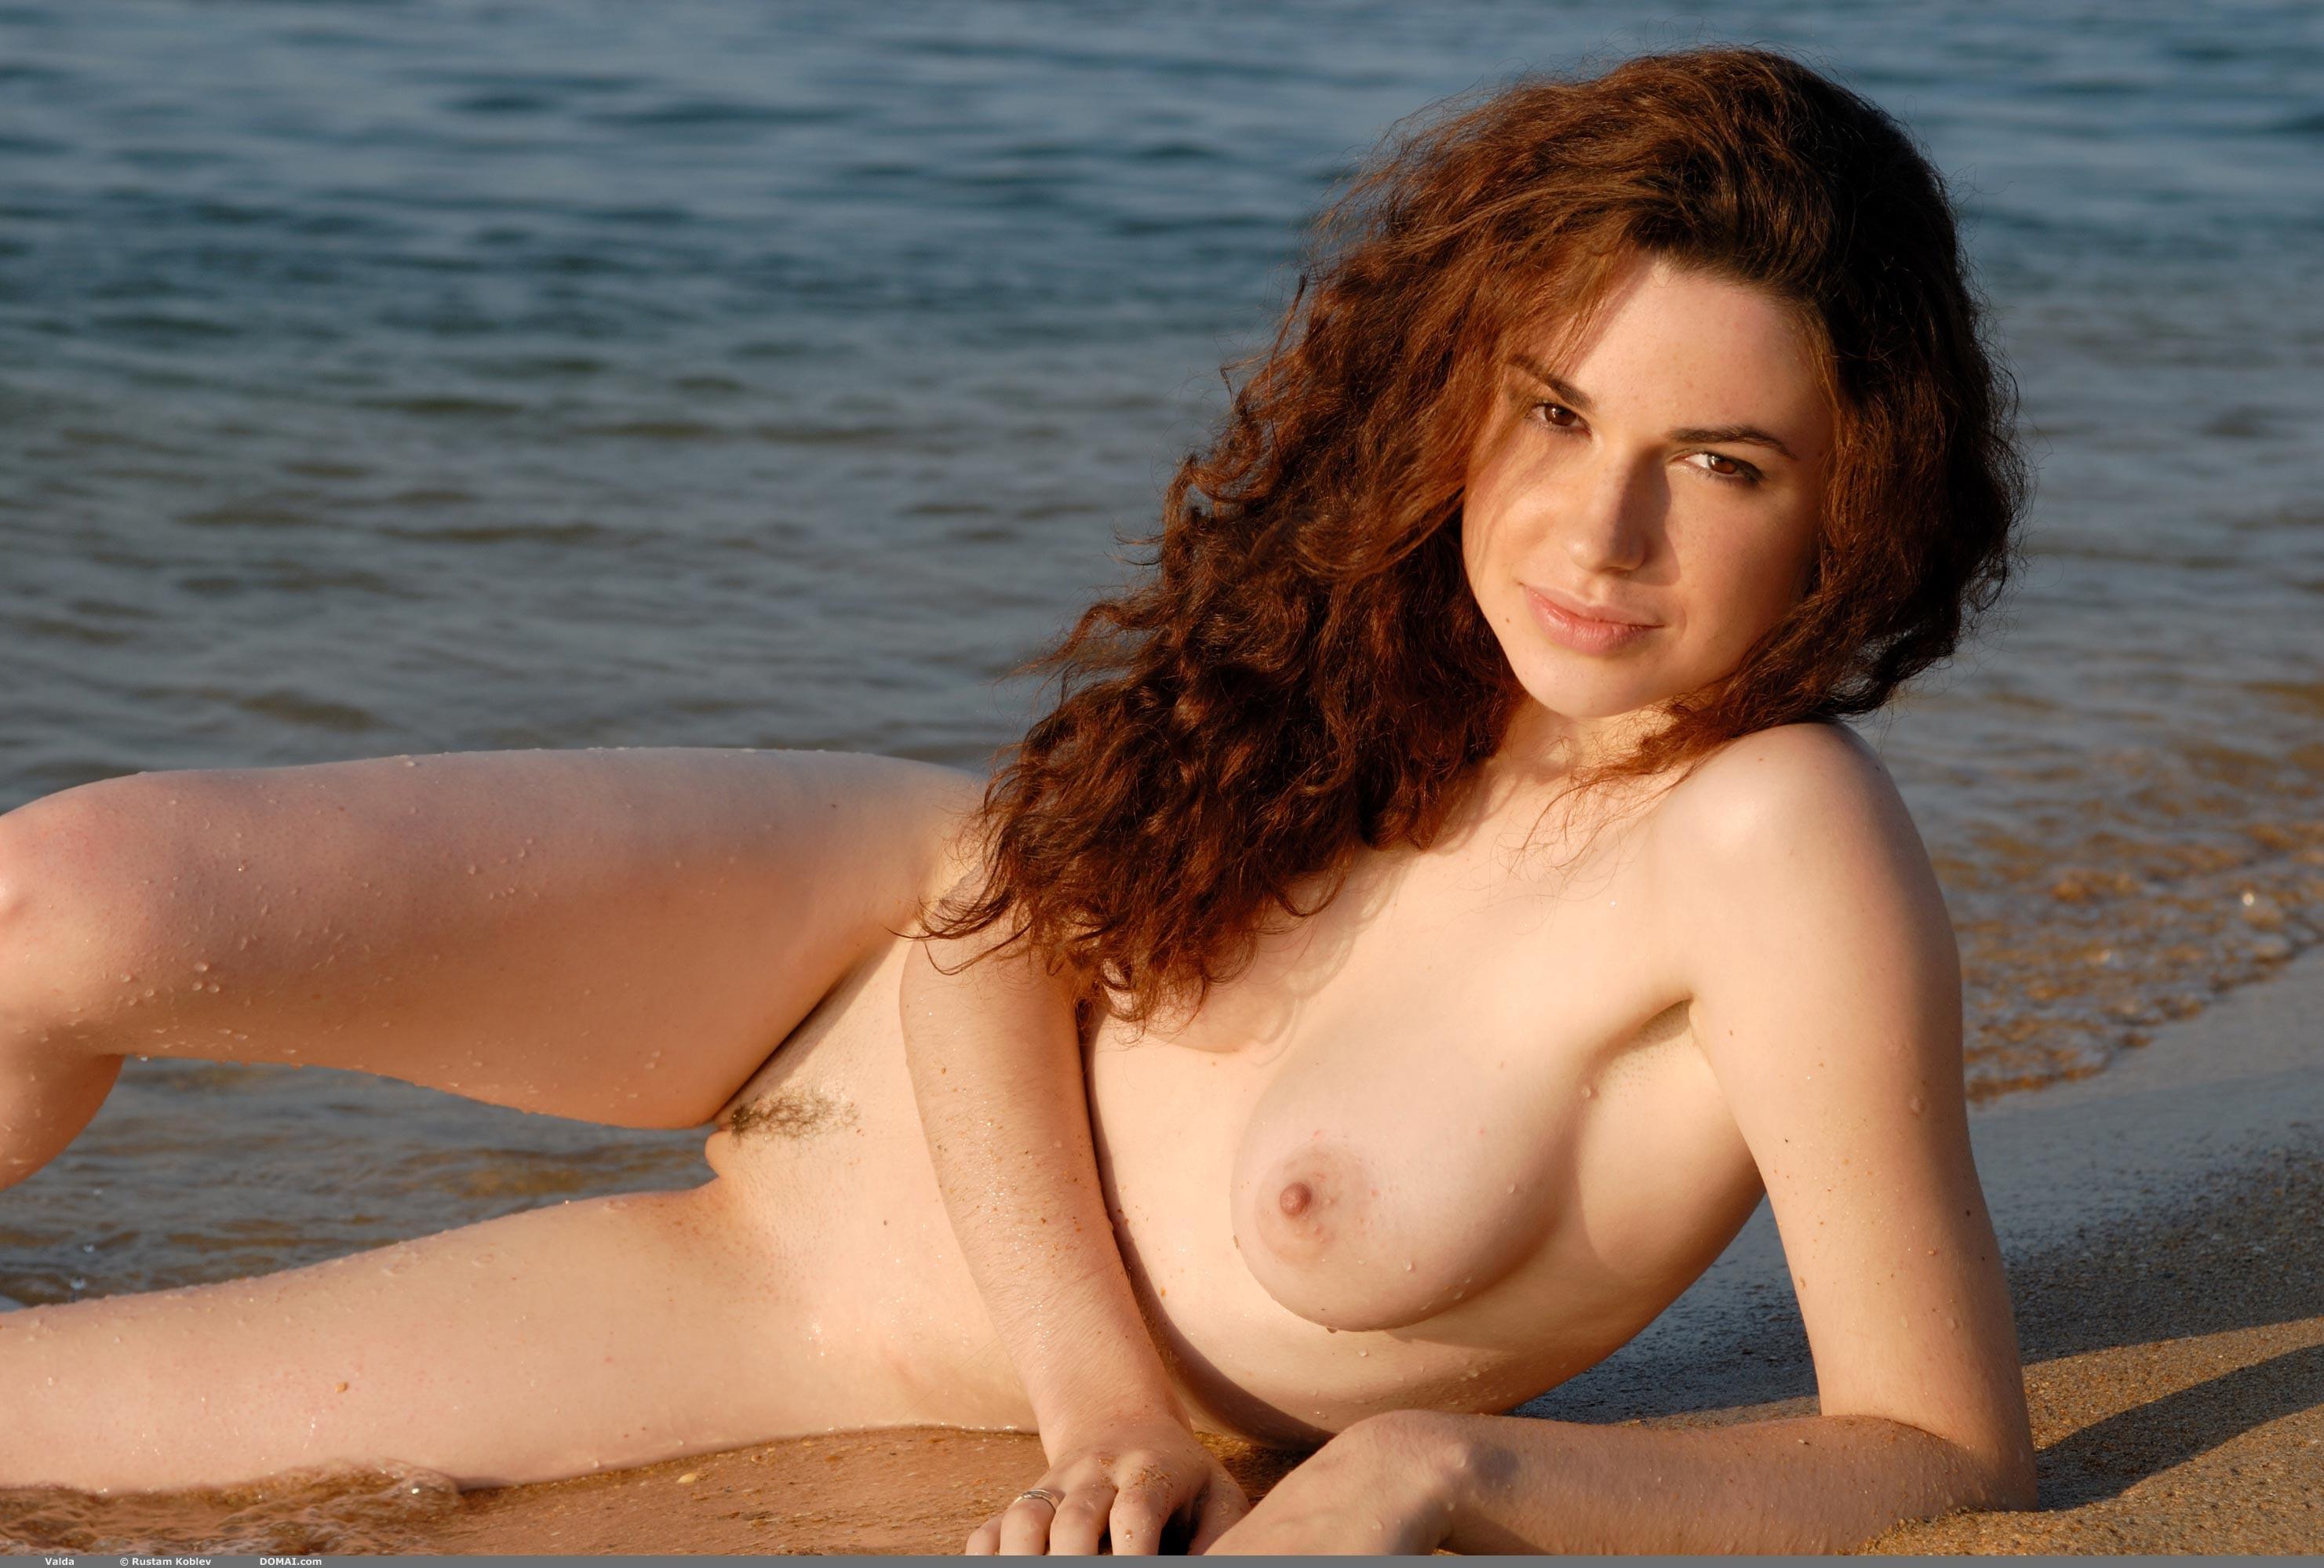 Puffy nipple beach girls consider, that